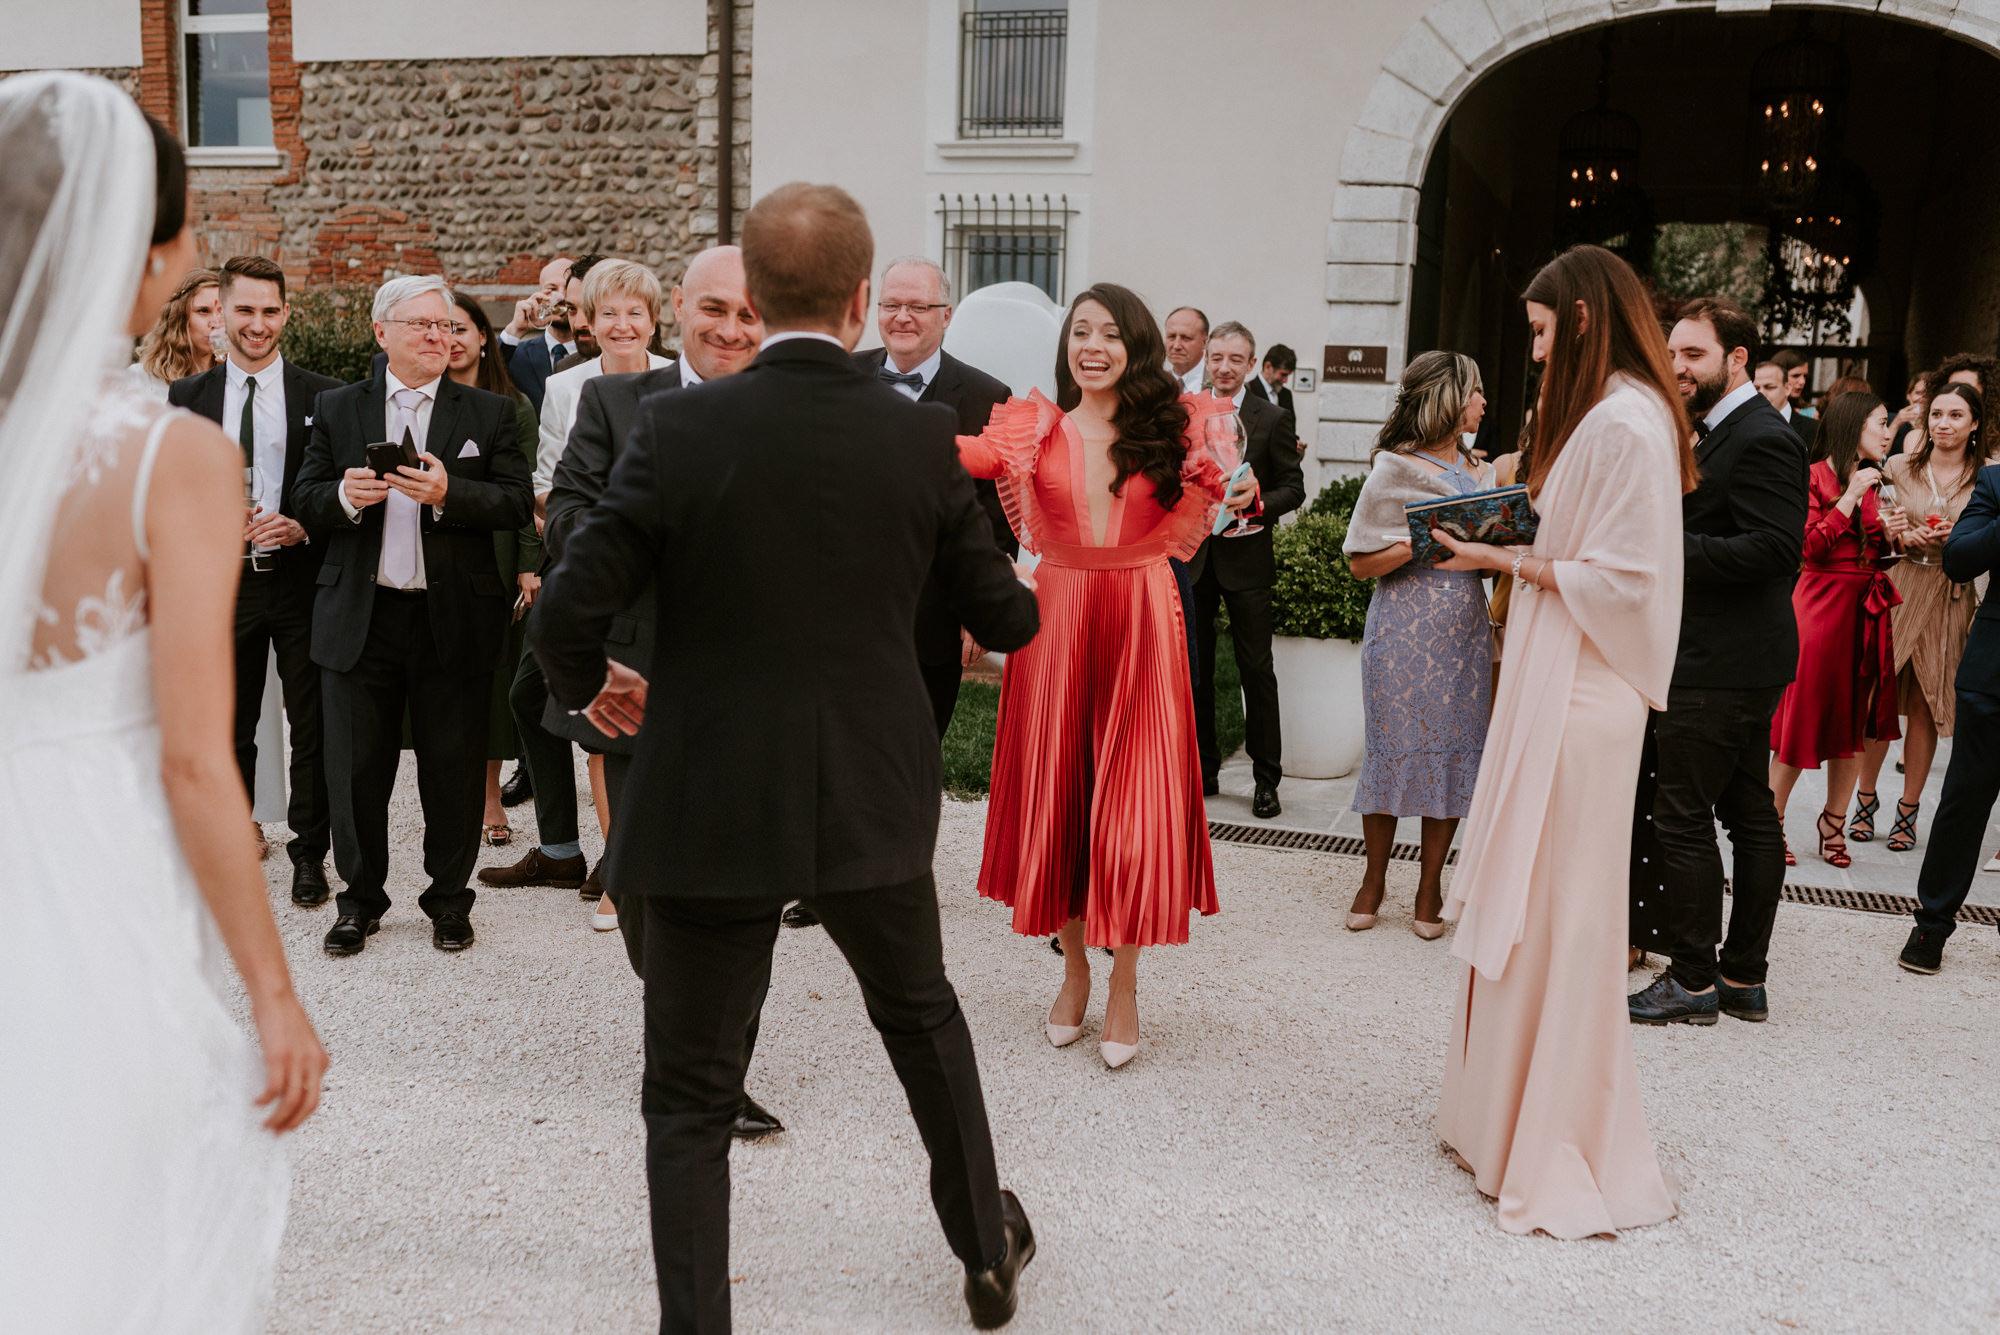 FOTO+PHOTO+BODA+WEDDING+ITALIA+ITALY+MAURICIO+GARAY+MAURICIOGARAY+WEDDINPHOTOGRAPHER+FOTOGRAFODEBODA-1384.jpg